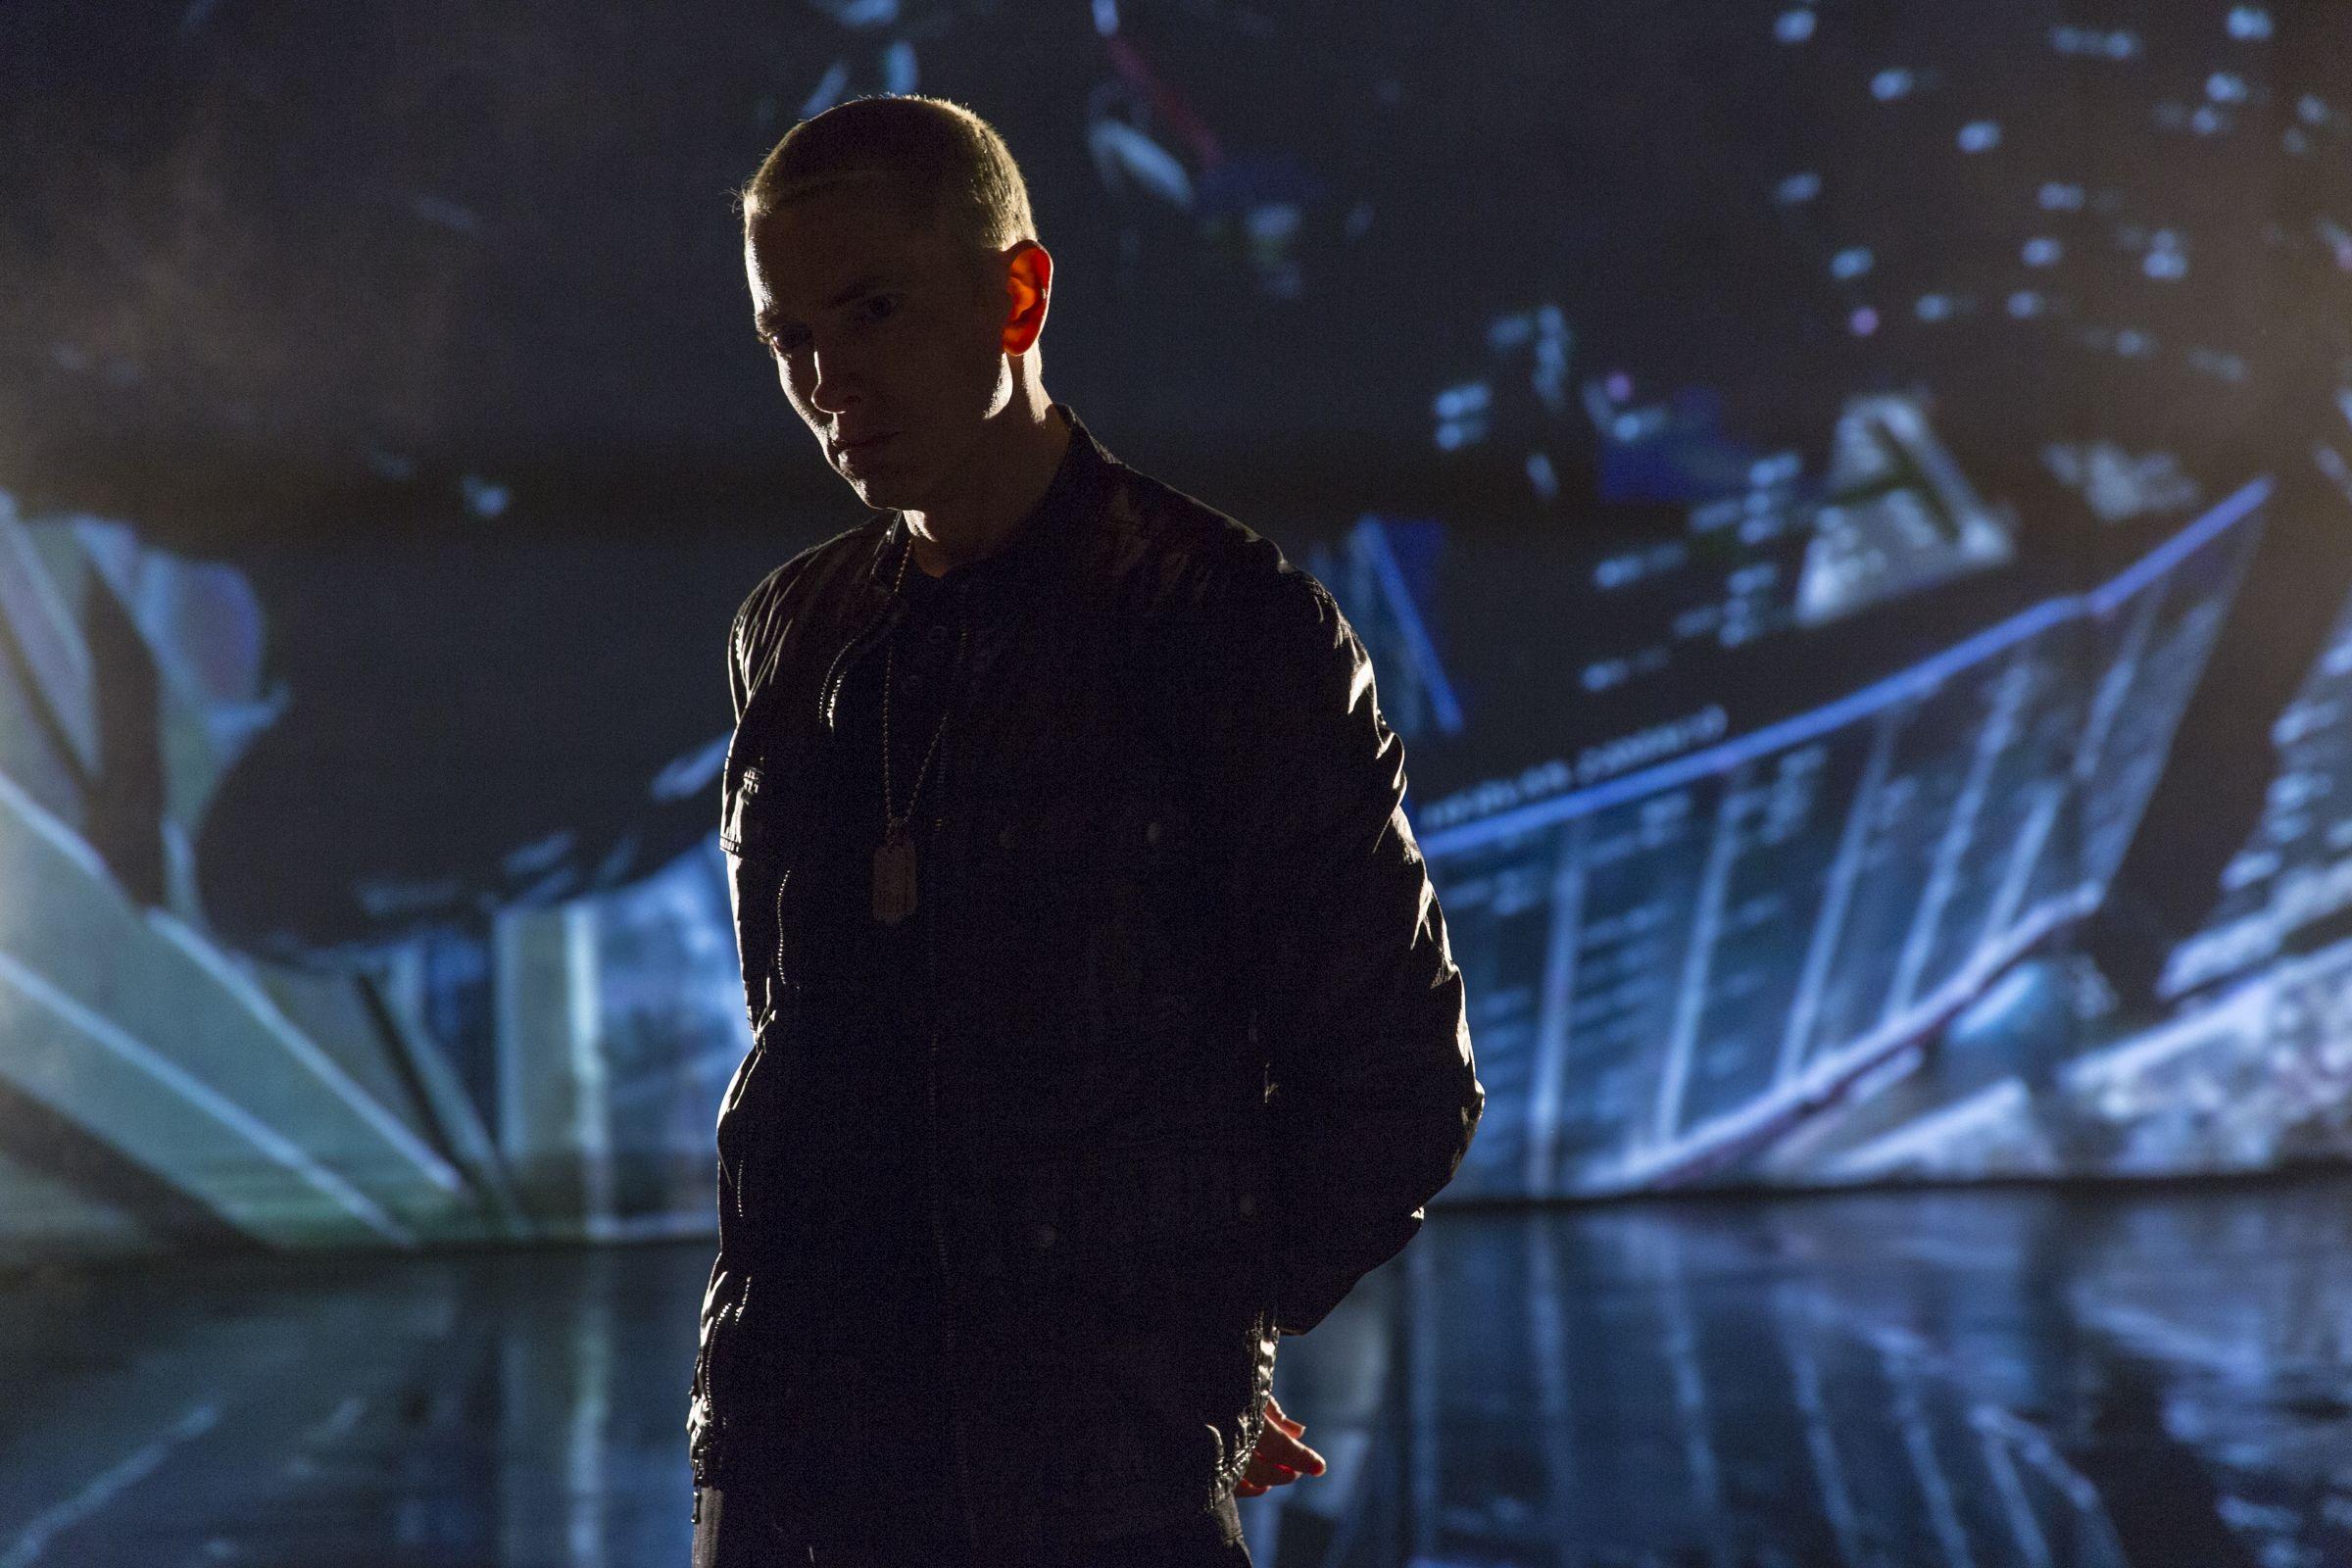 Eminem Wallpaper Iphone 5 Eminem Survival Full Hd Wallpaper And Background Image